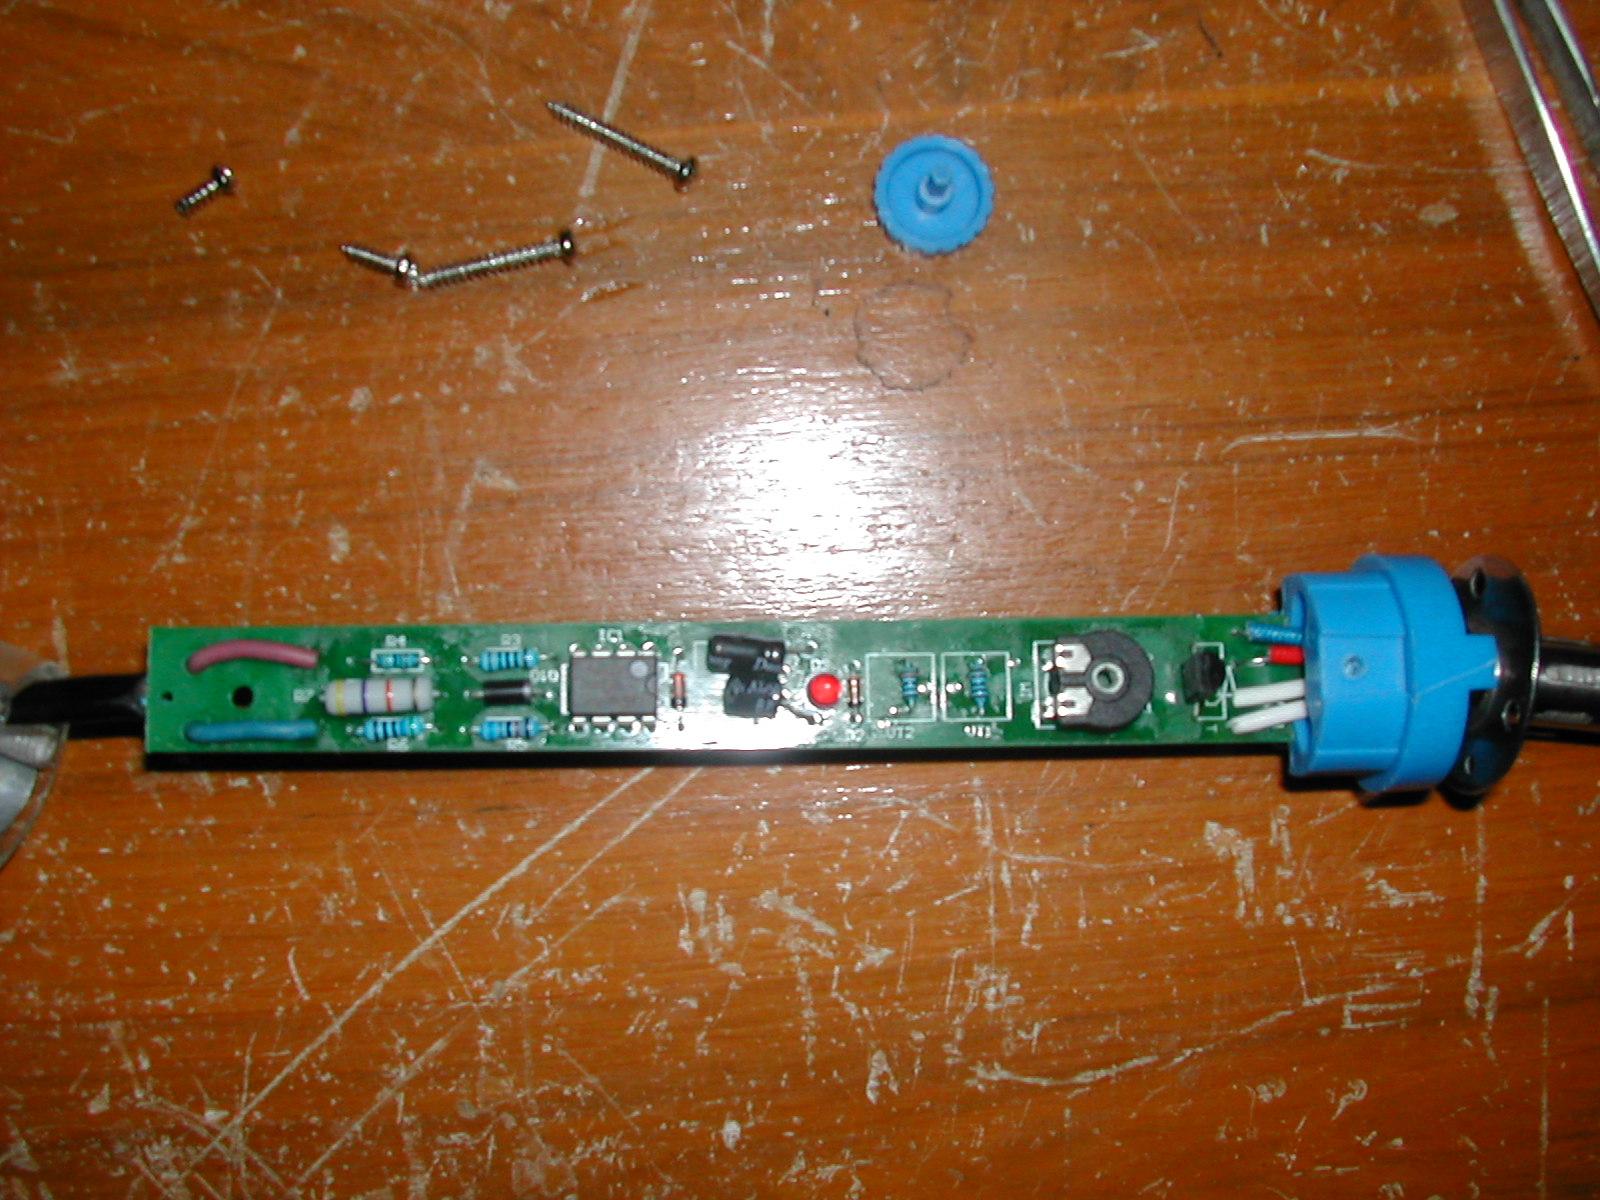 soldering iron wiring diagram 3 phase ct meter diagrams thermo couple gas valve elsavadorla